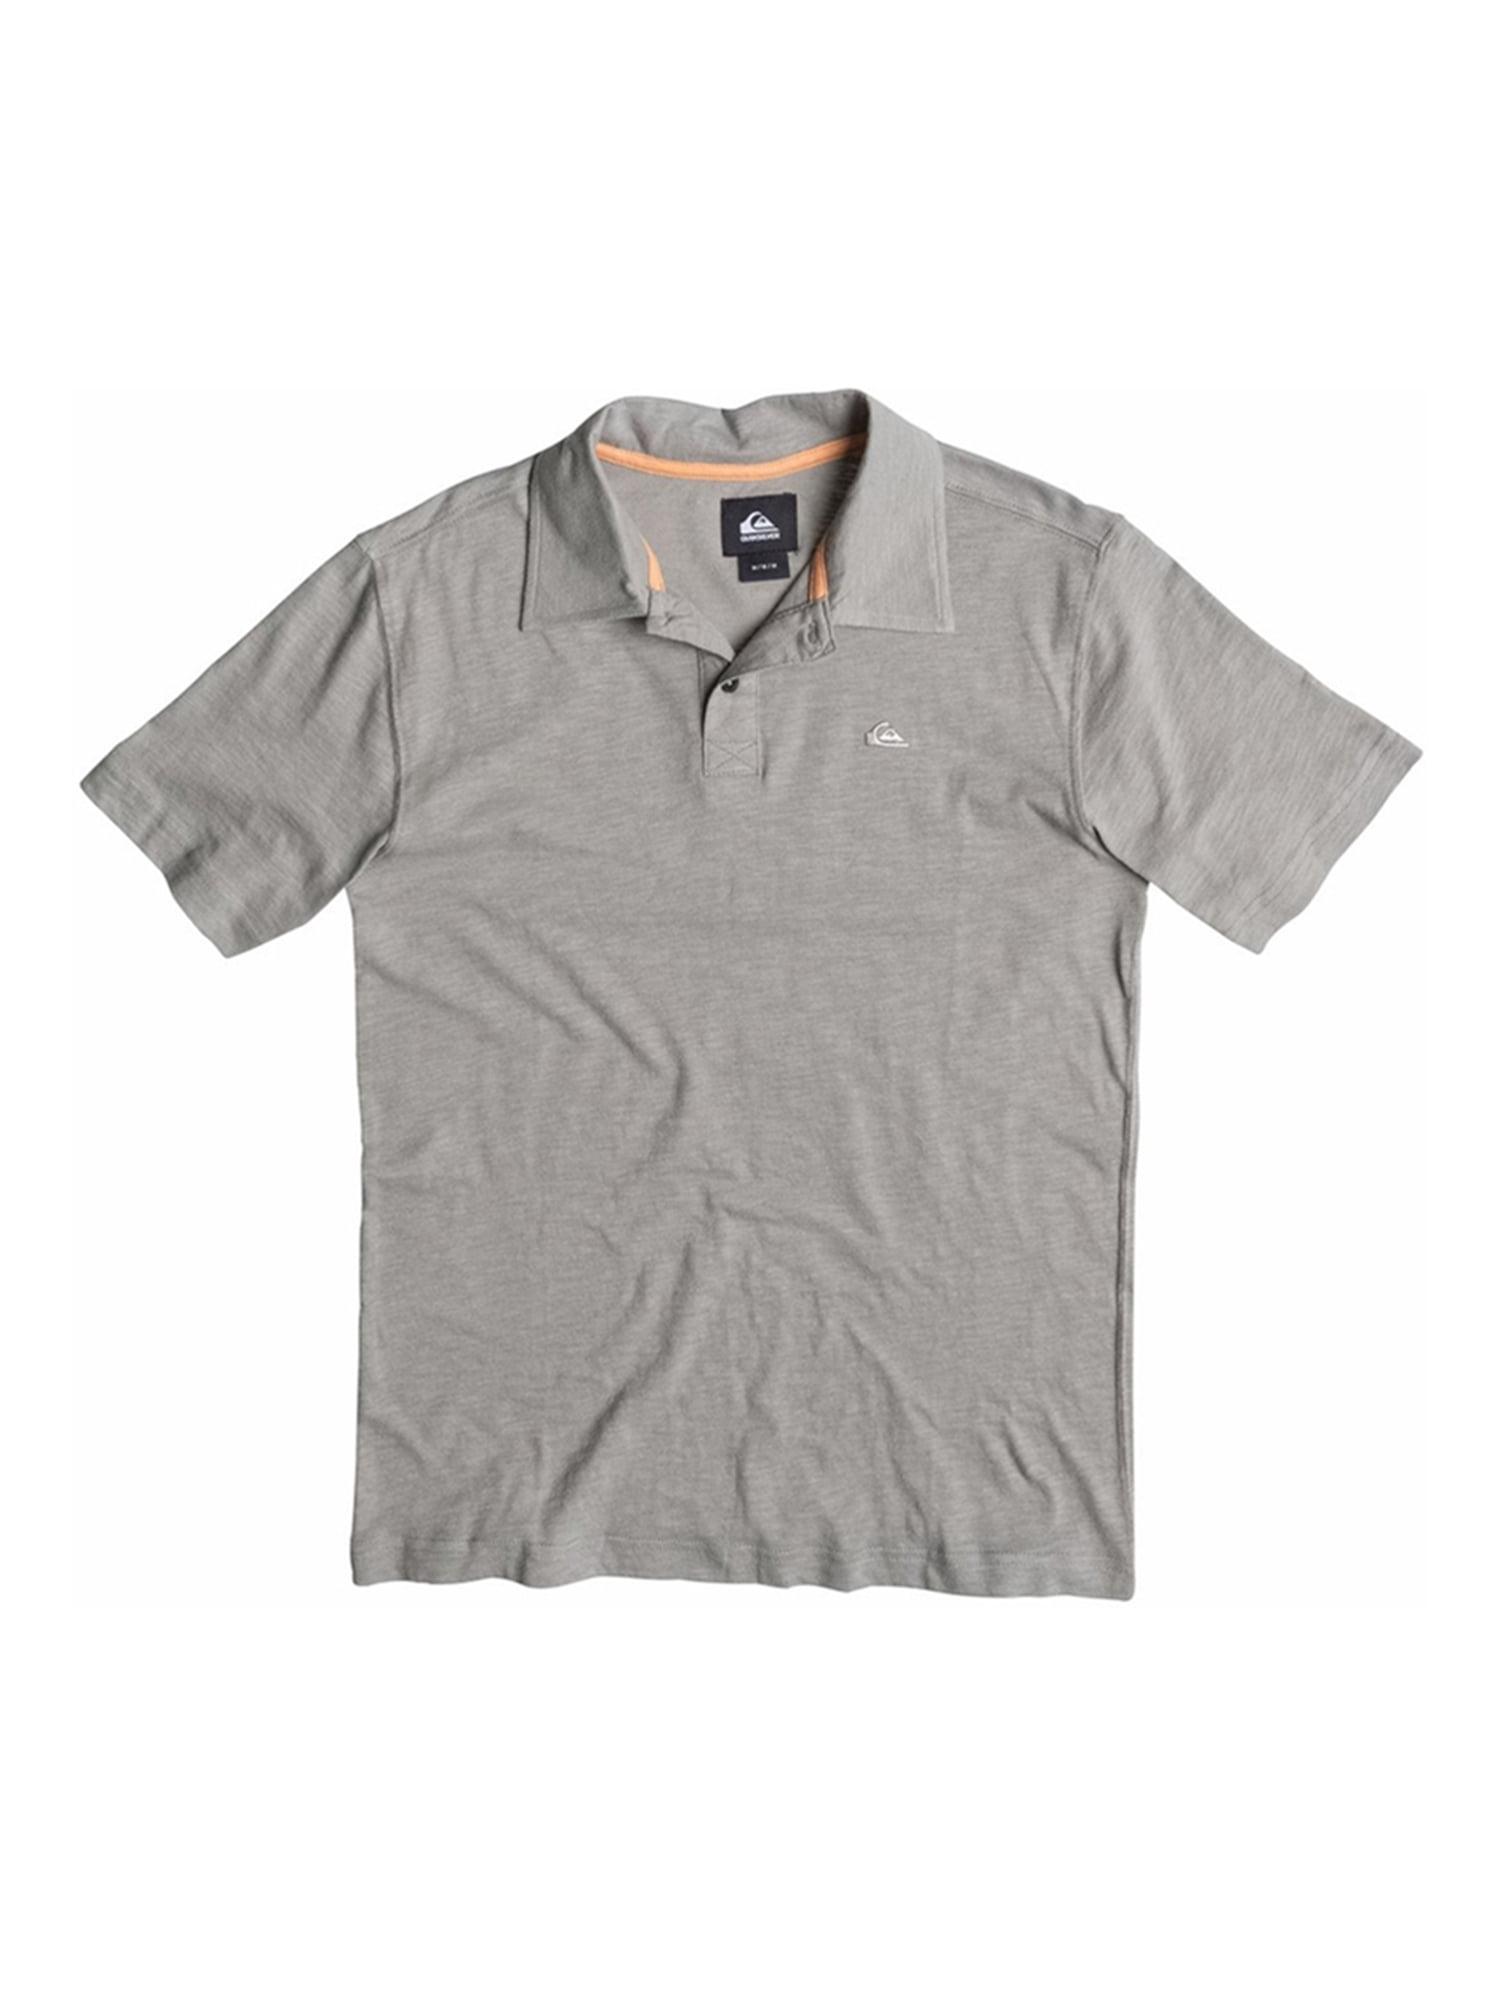 Quiksilver Boys Moss Side Rugby Polo Shirt smc0 4 - Little Kids (4-7)